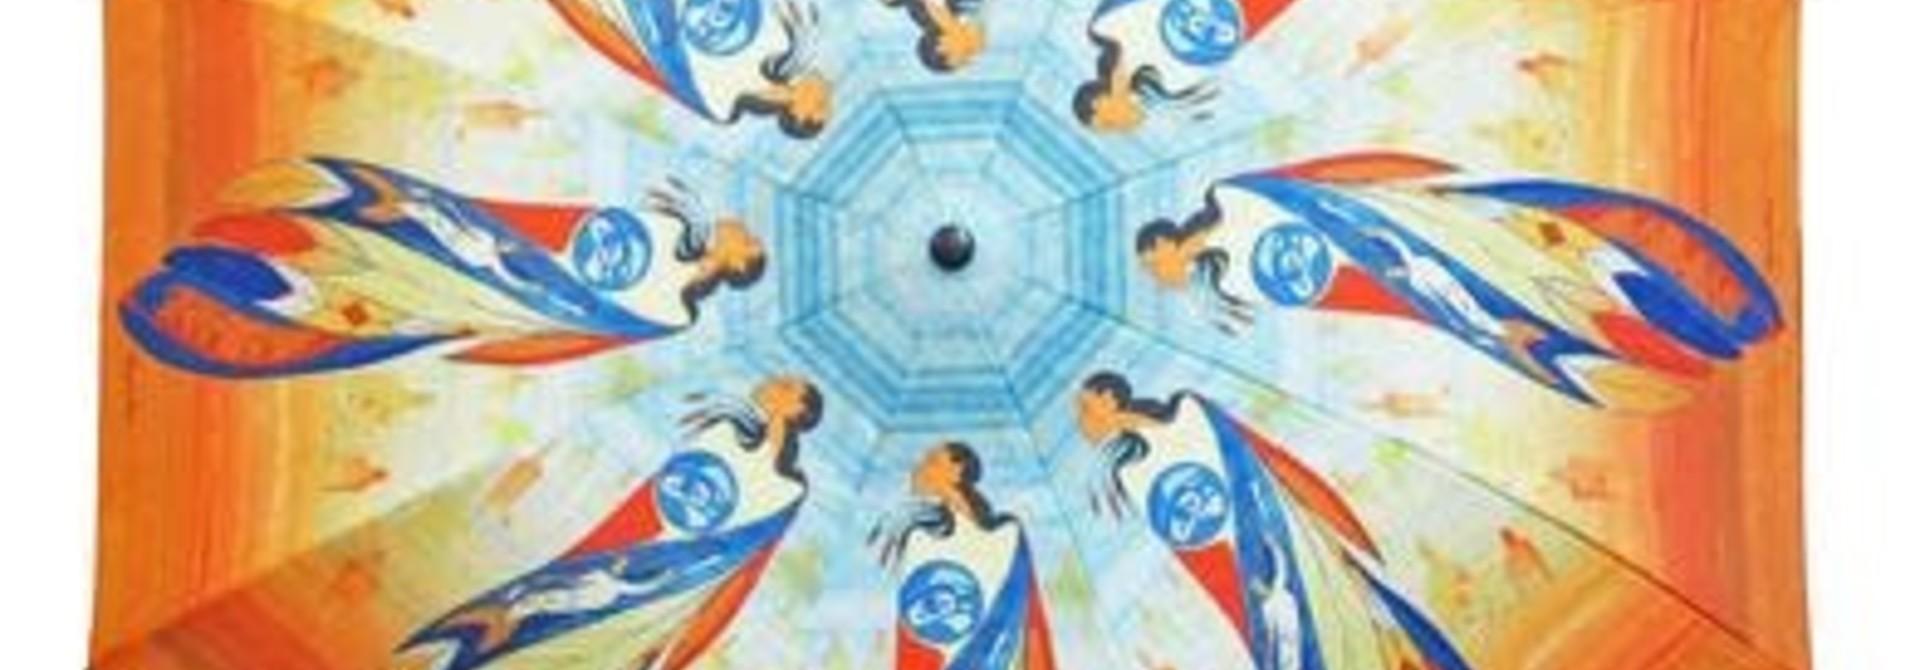 Collapsable Umbrella - Not Forgotten by Maxine Noel